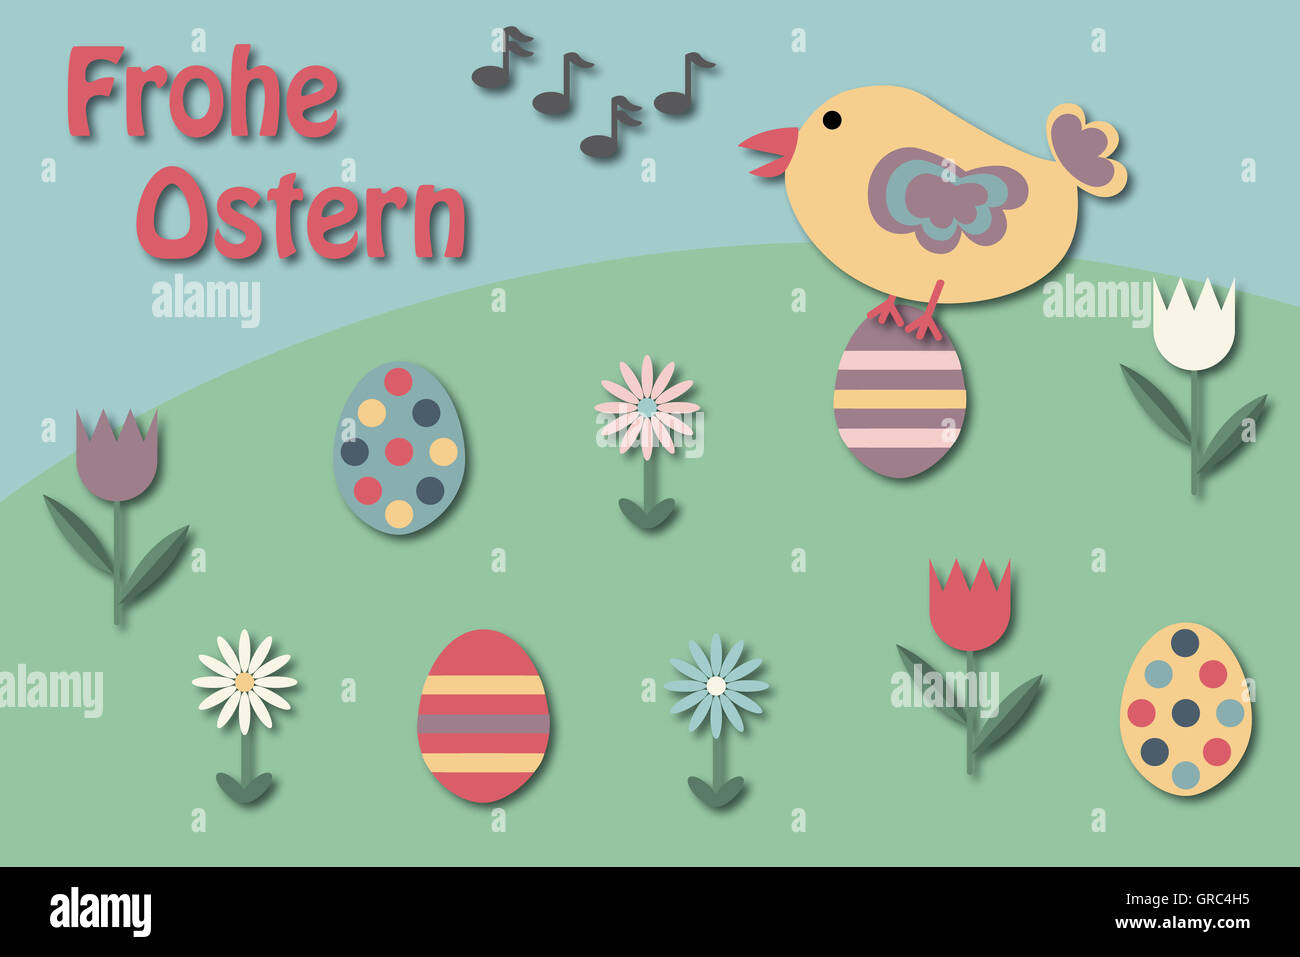 Ostern Grußkarte Stockbild